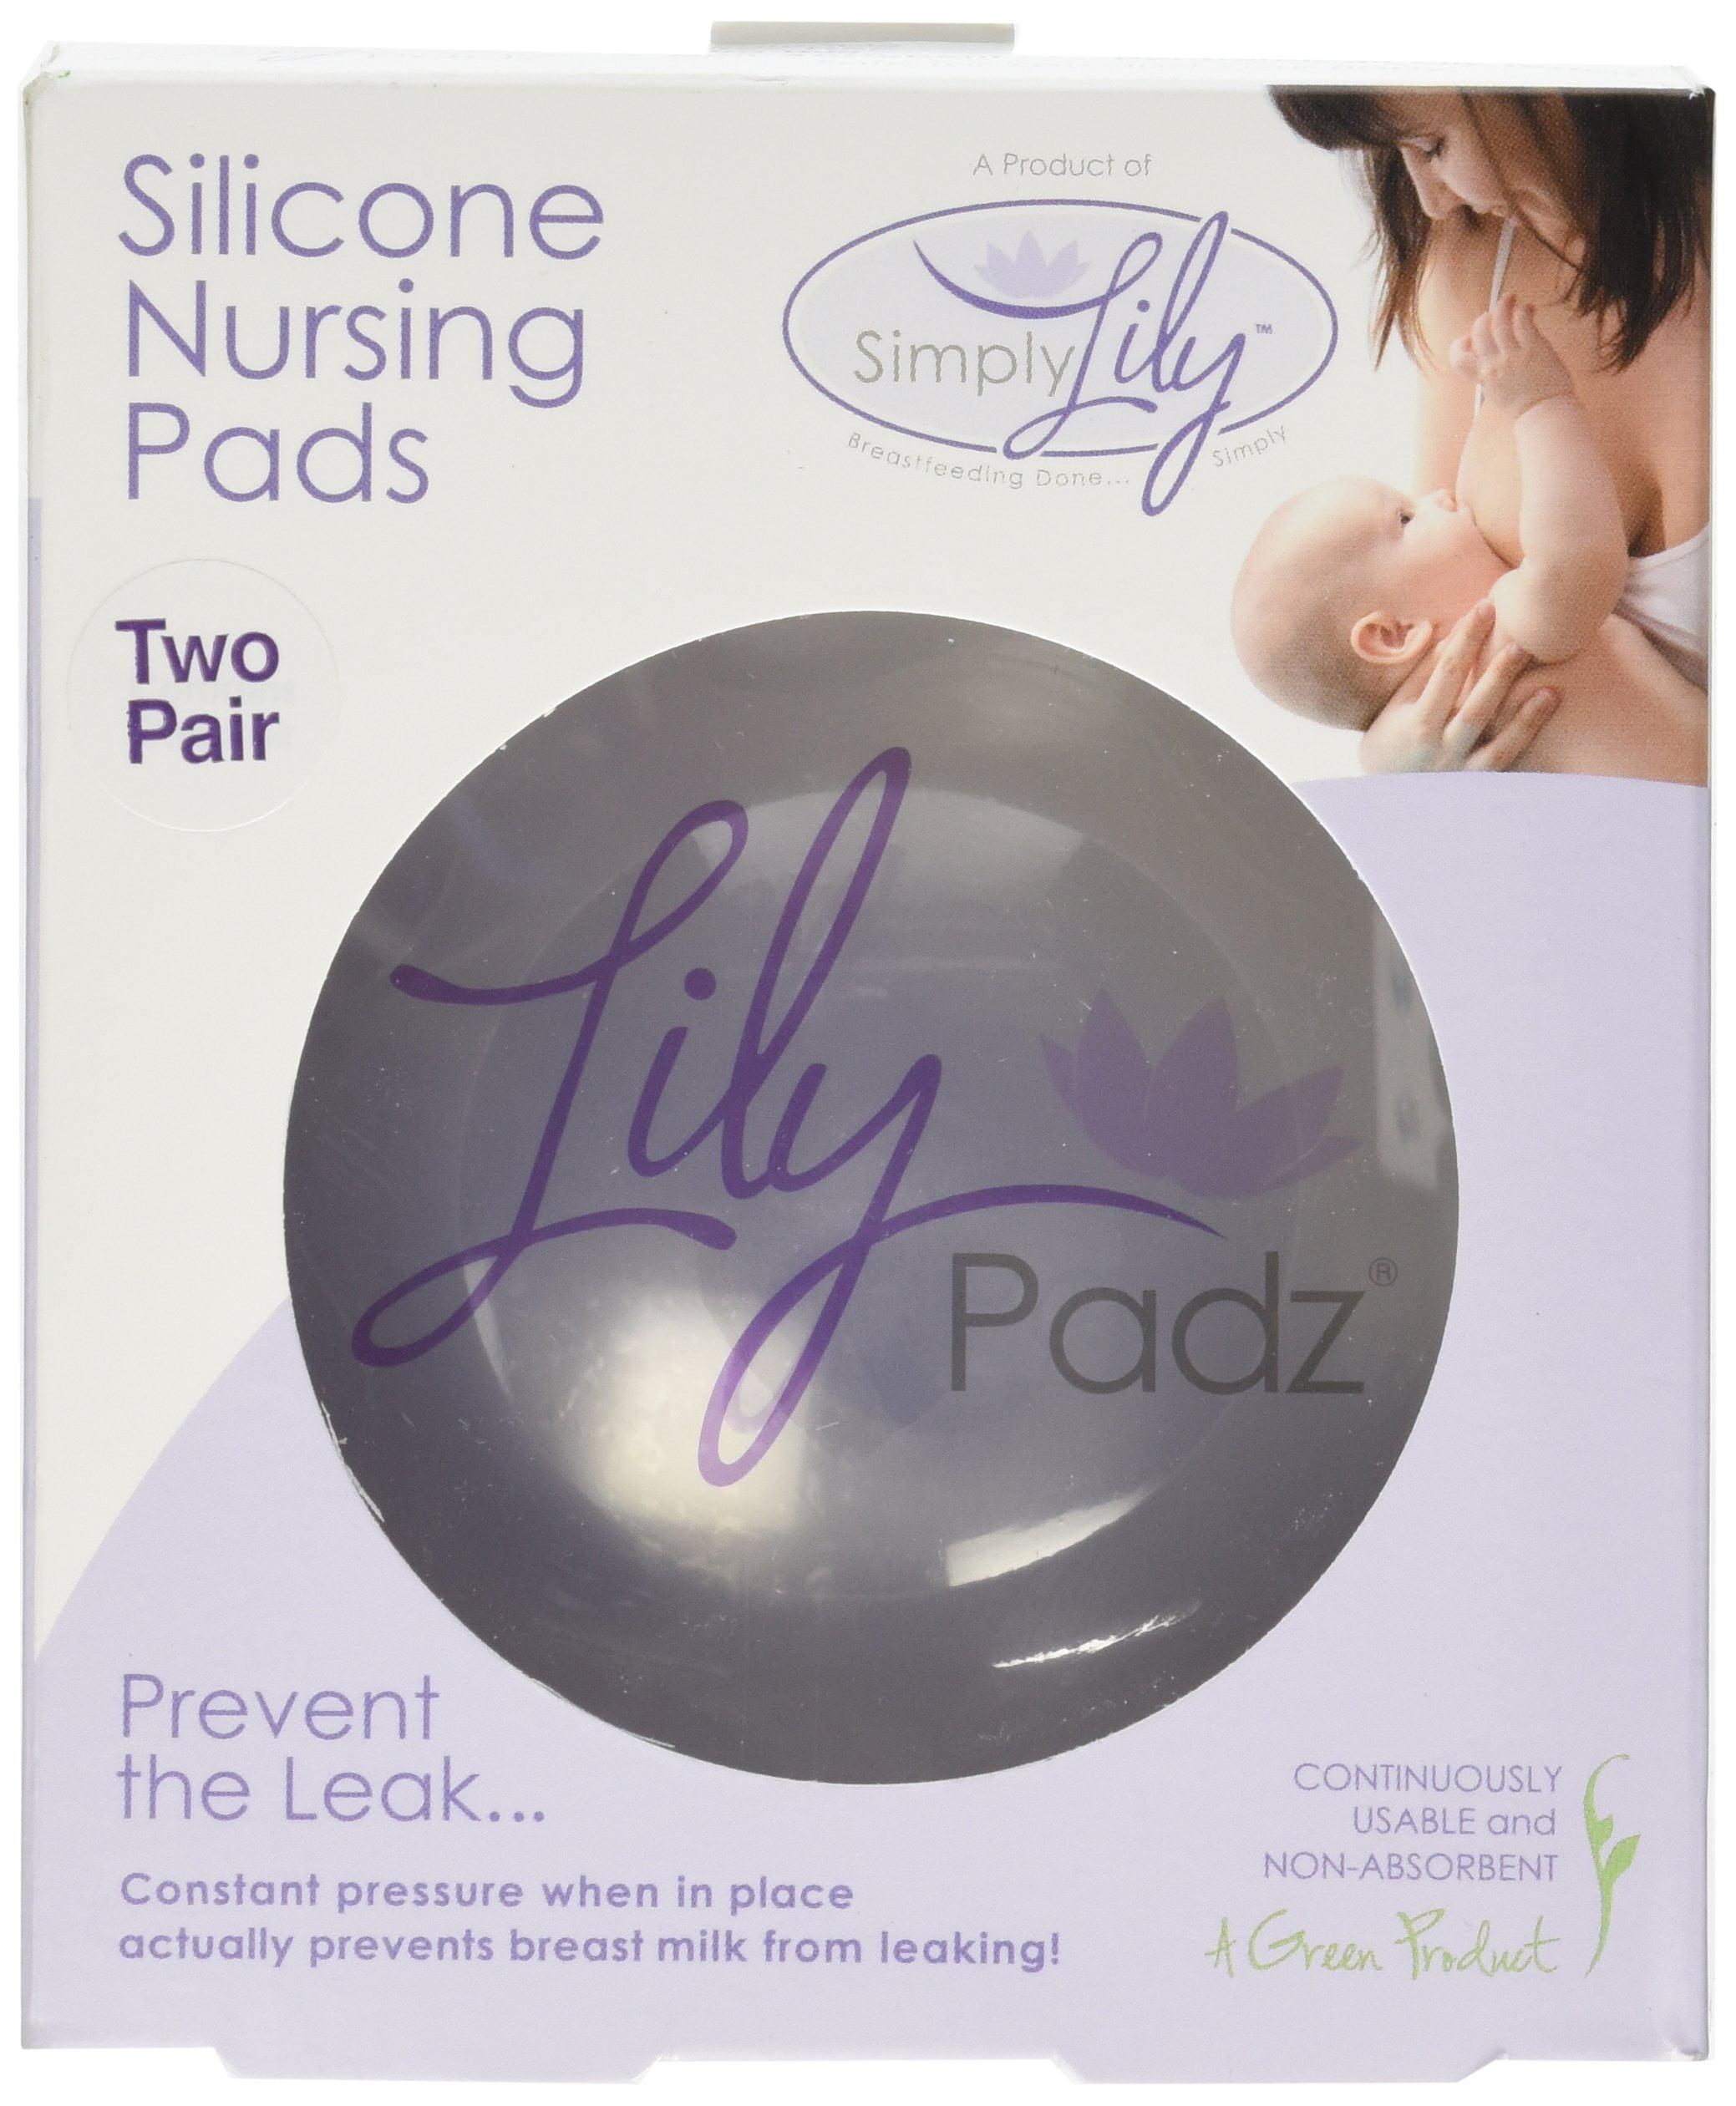 LilyPadz Reusable Silicone Nursing Pads Double Pair Regular Size by LilyPadz